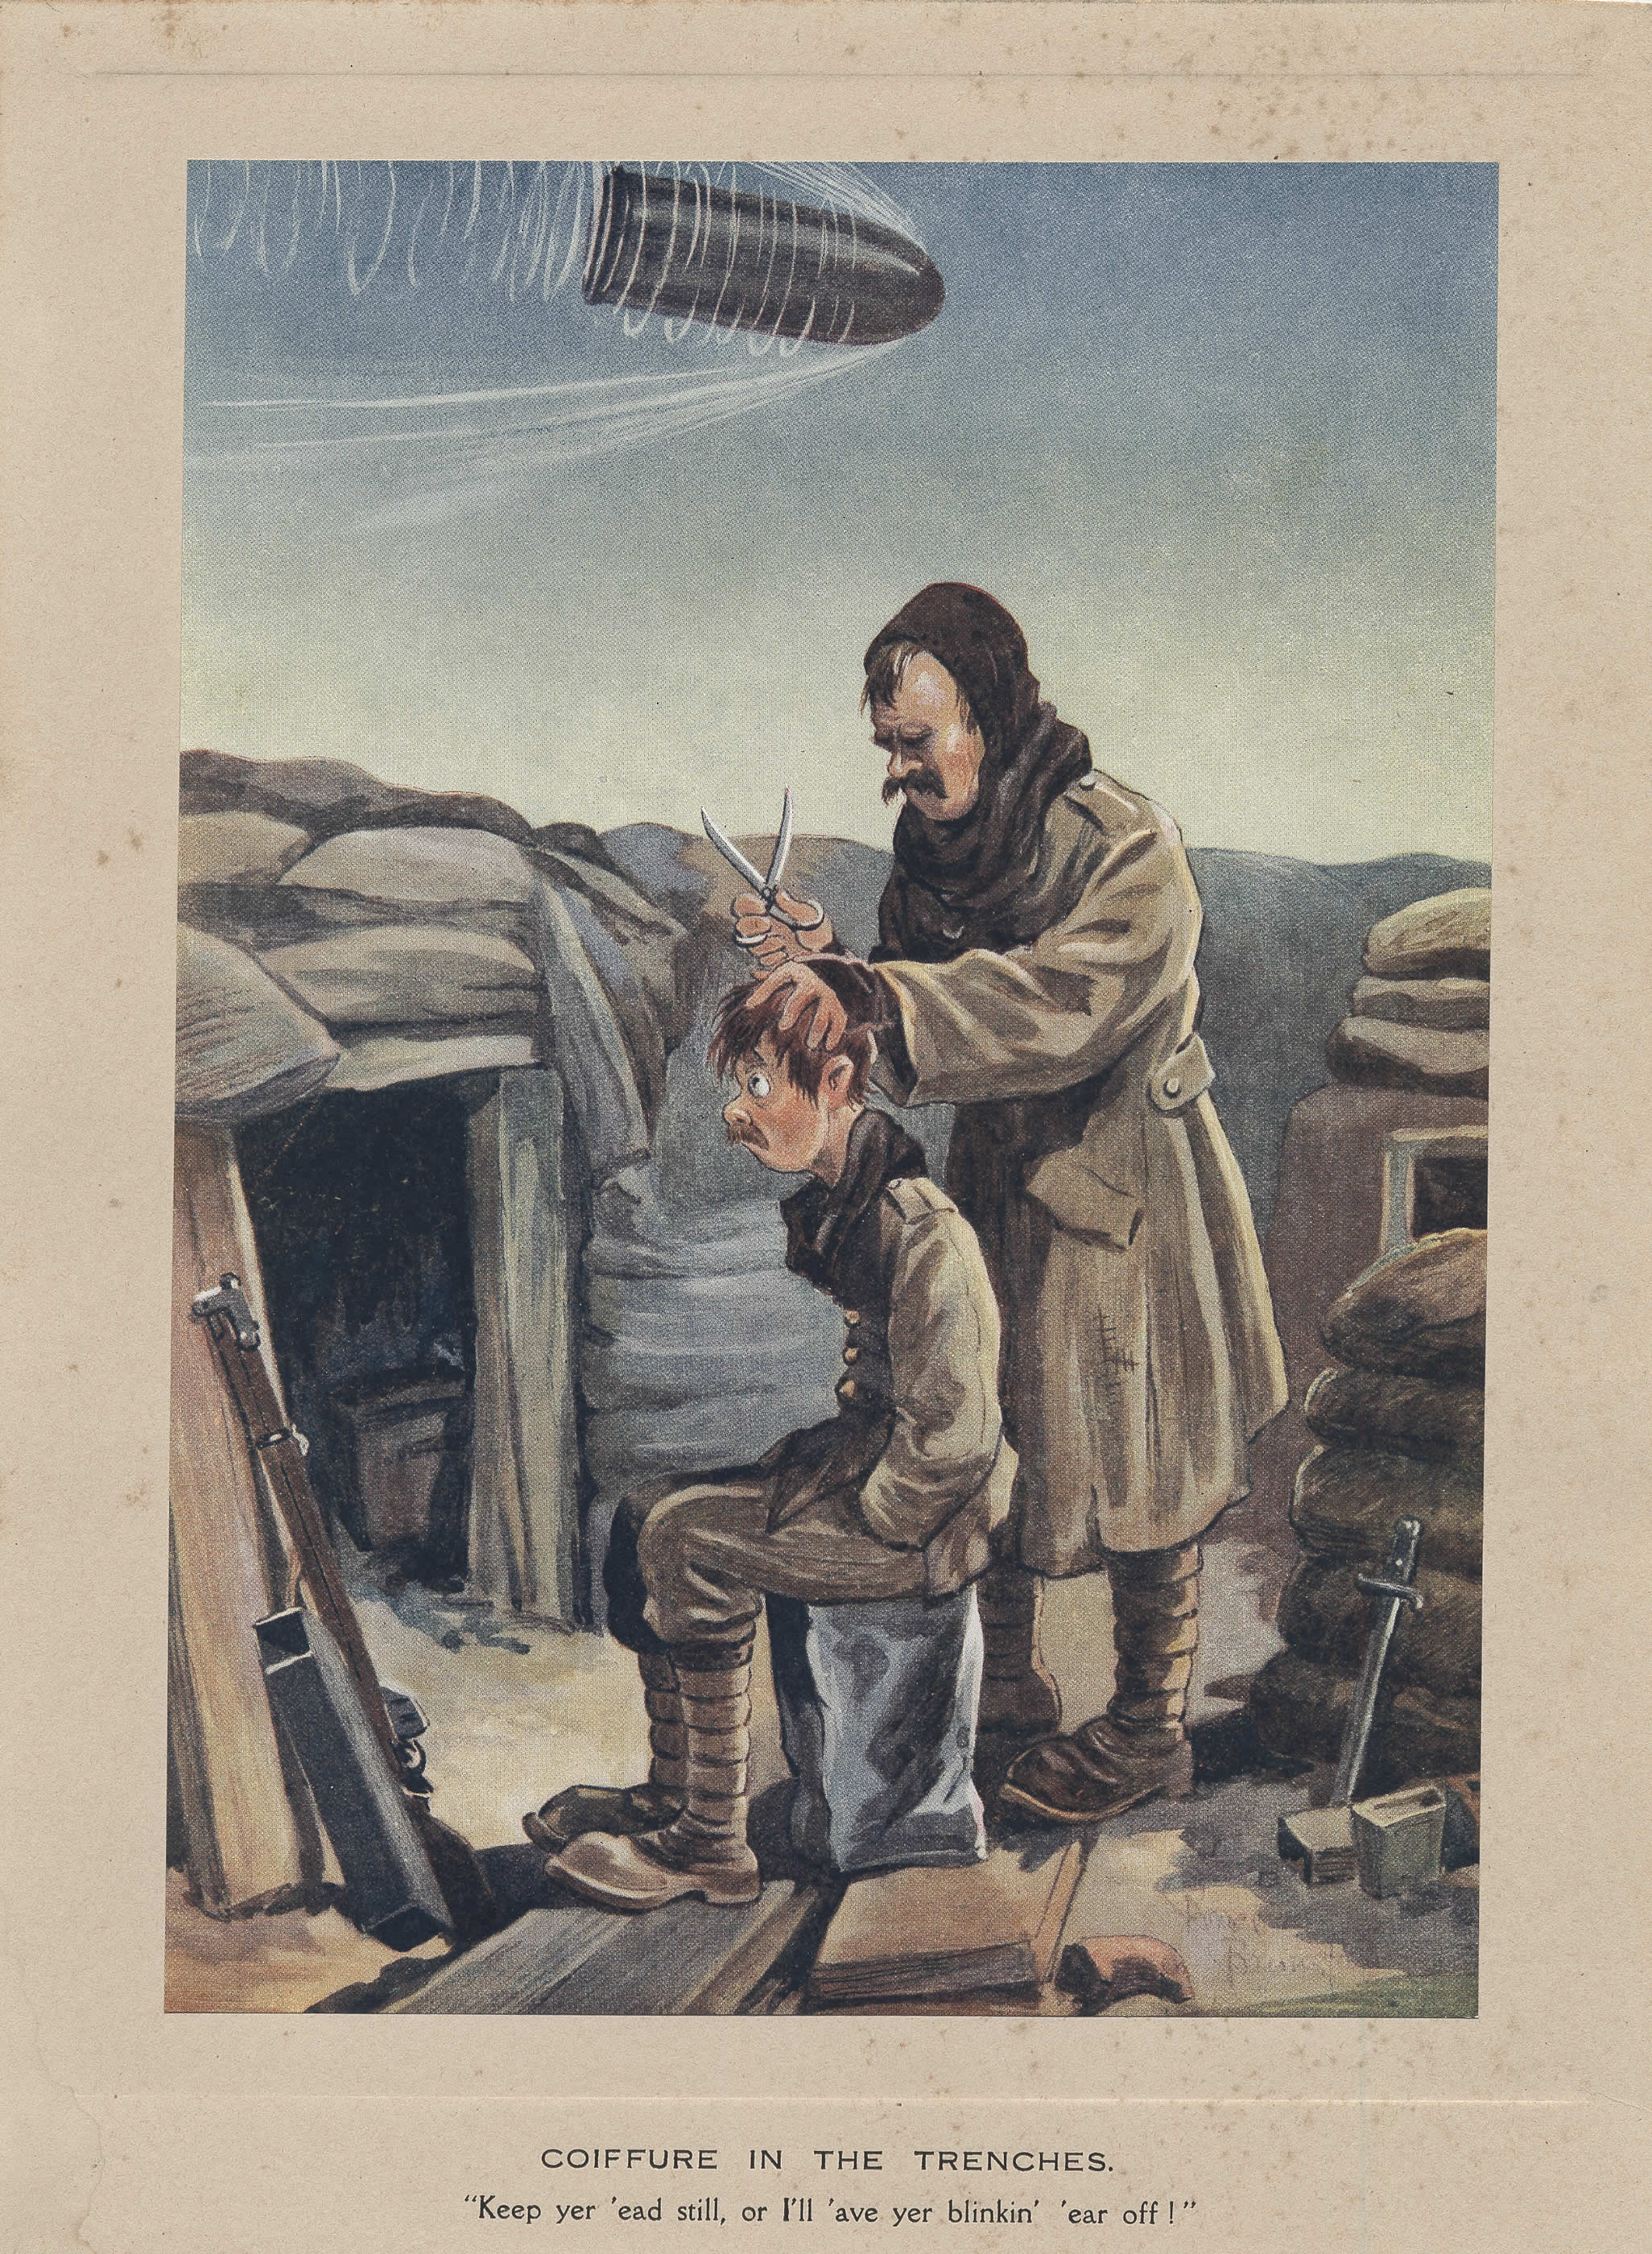 Coiffure in the Trenches (Coupe de cheveux dans les tranchées)